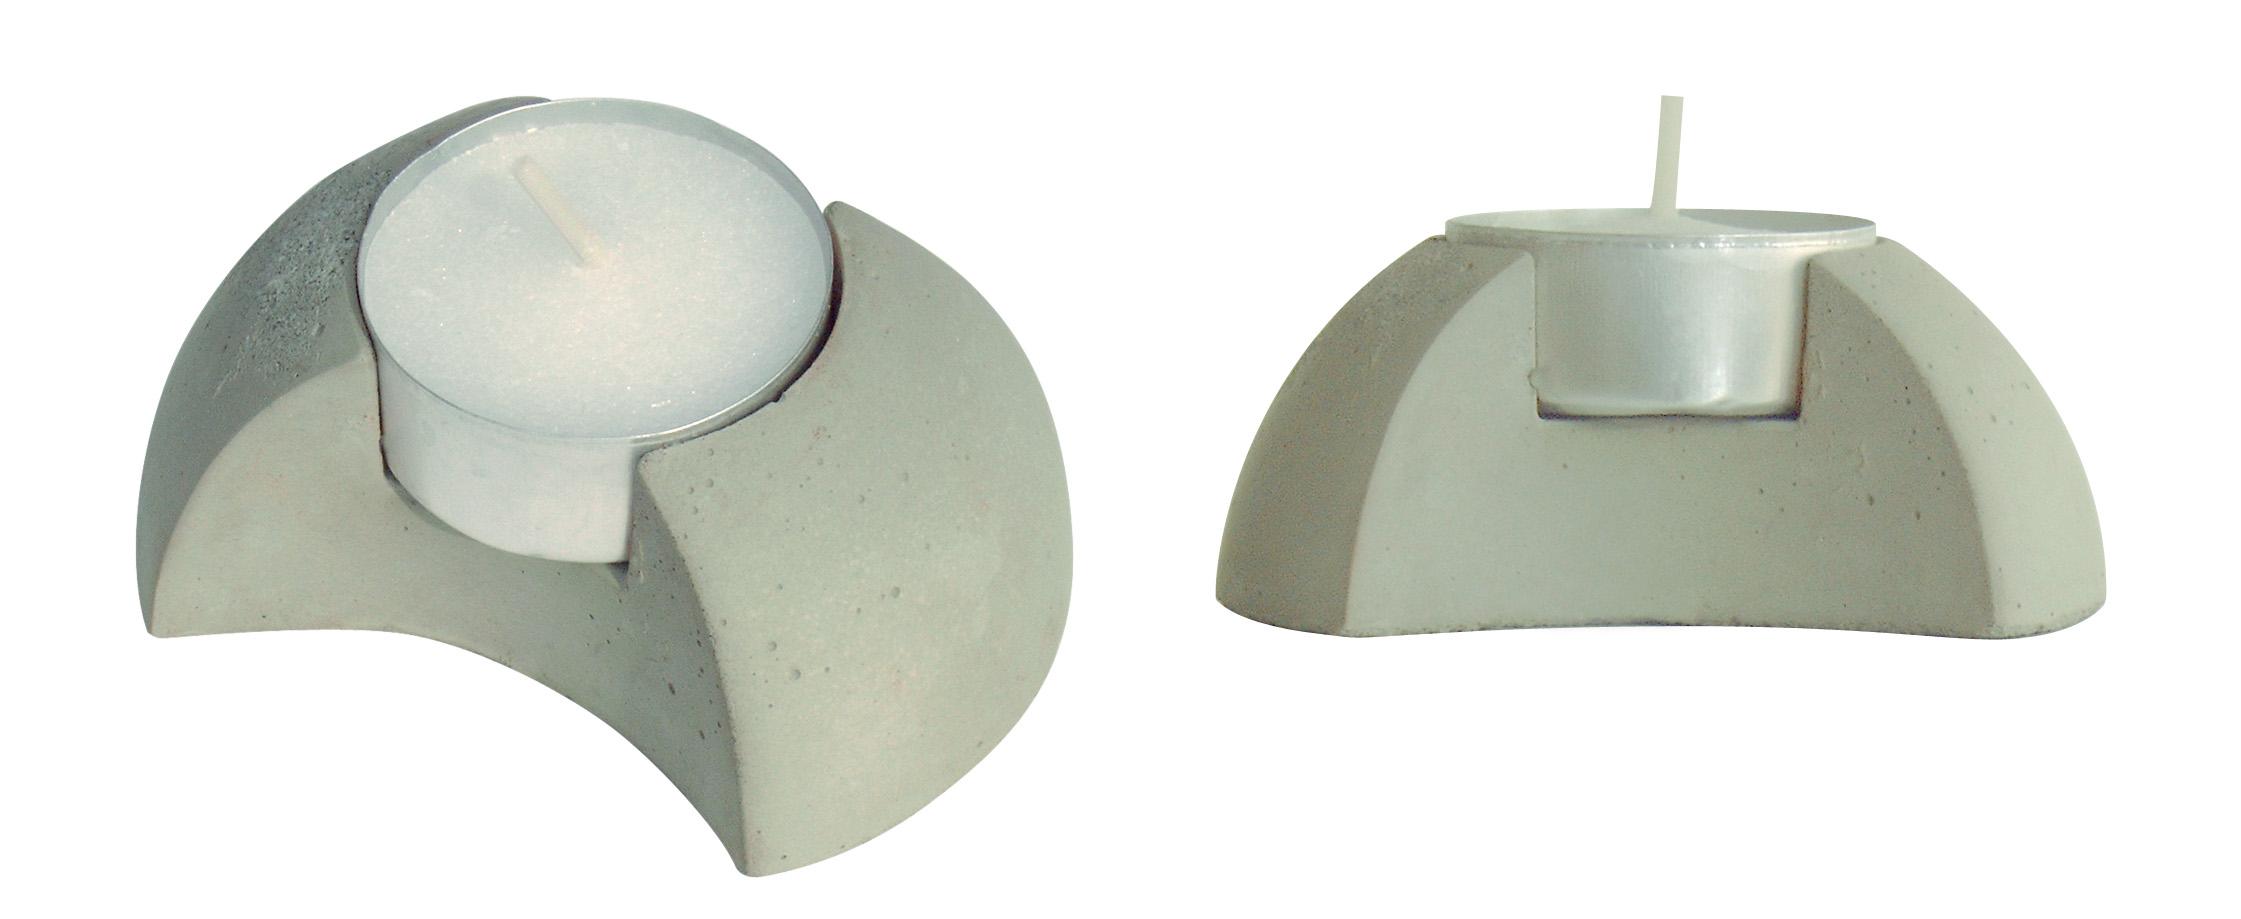 concrete candleholder sphere